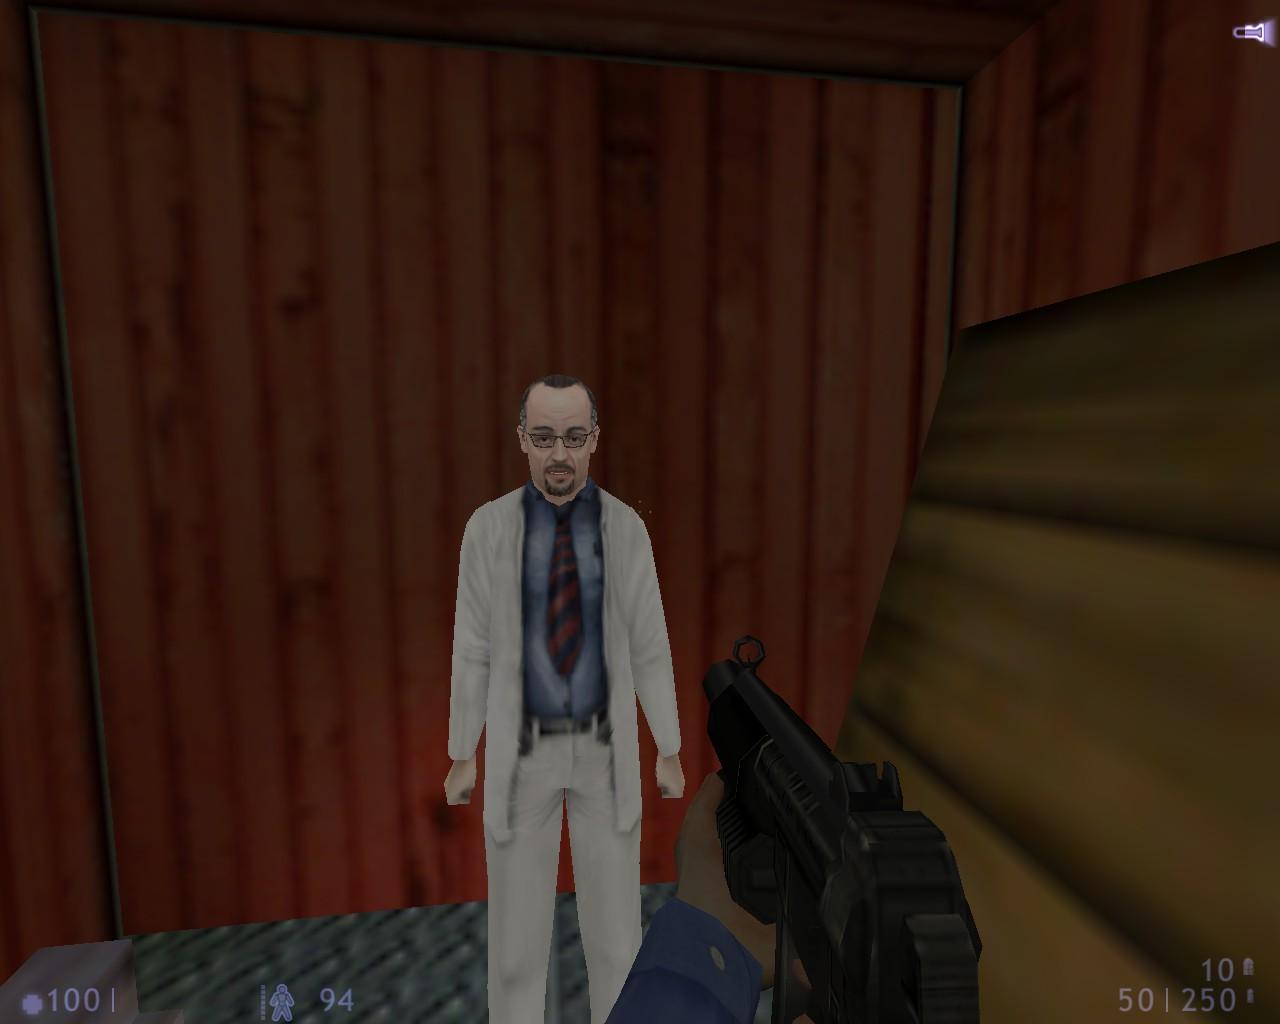 hl 2014-01-01 18-30-36-79.jpg - Half-Life